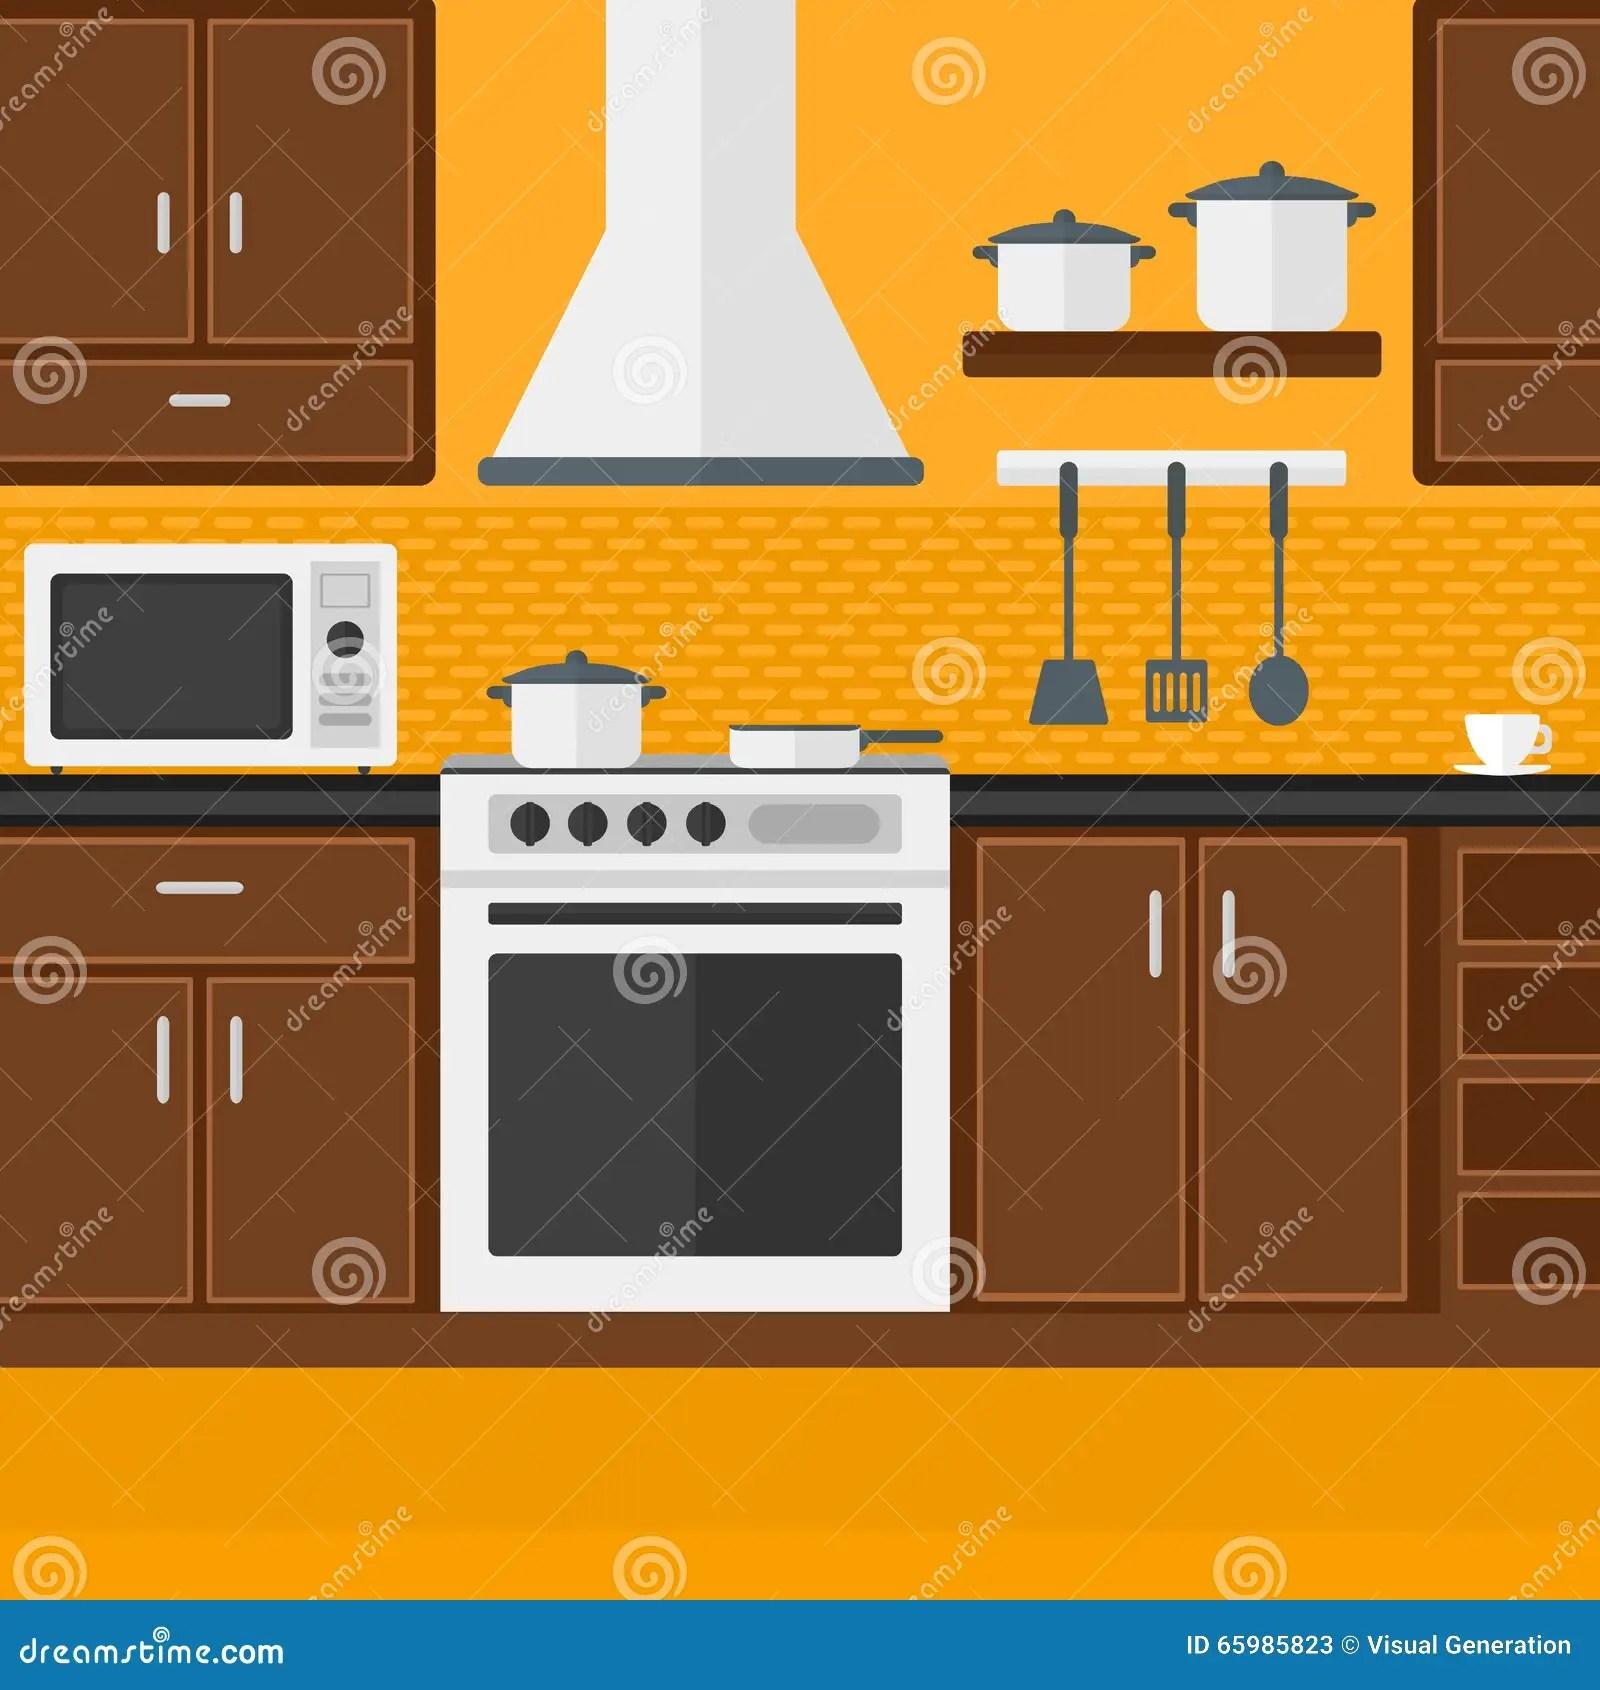 kitchen fork wall unit carcasses 厨房背景有装置的向量例证 插画包括有刀叉餐具 厨房 房子 国内 厨具 厨房背景有装置的